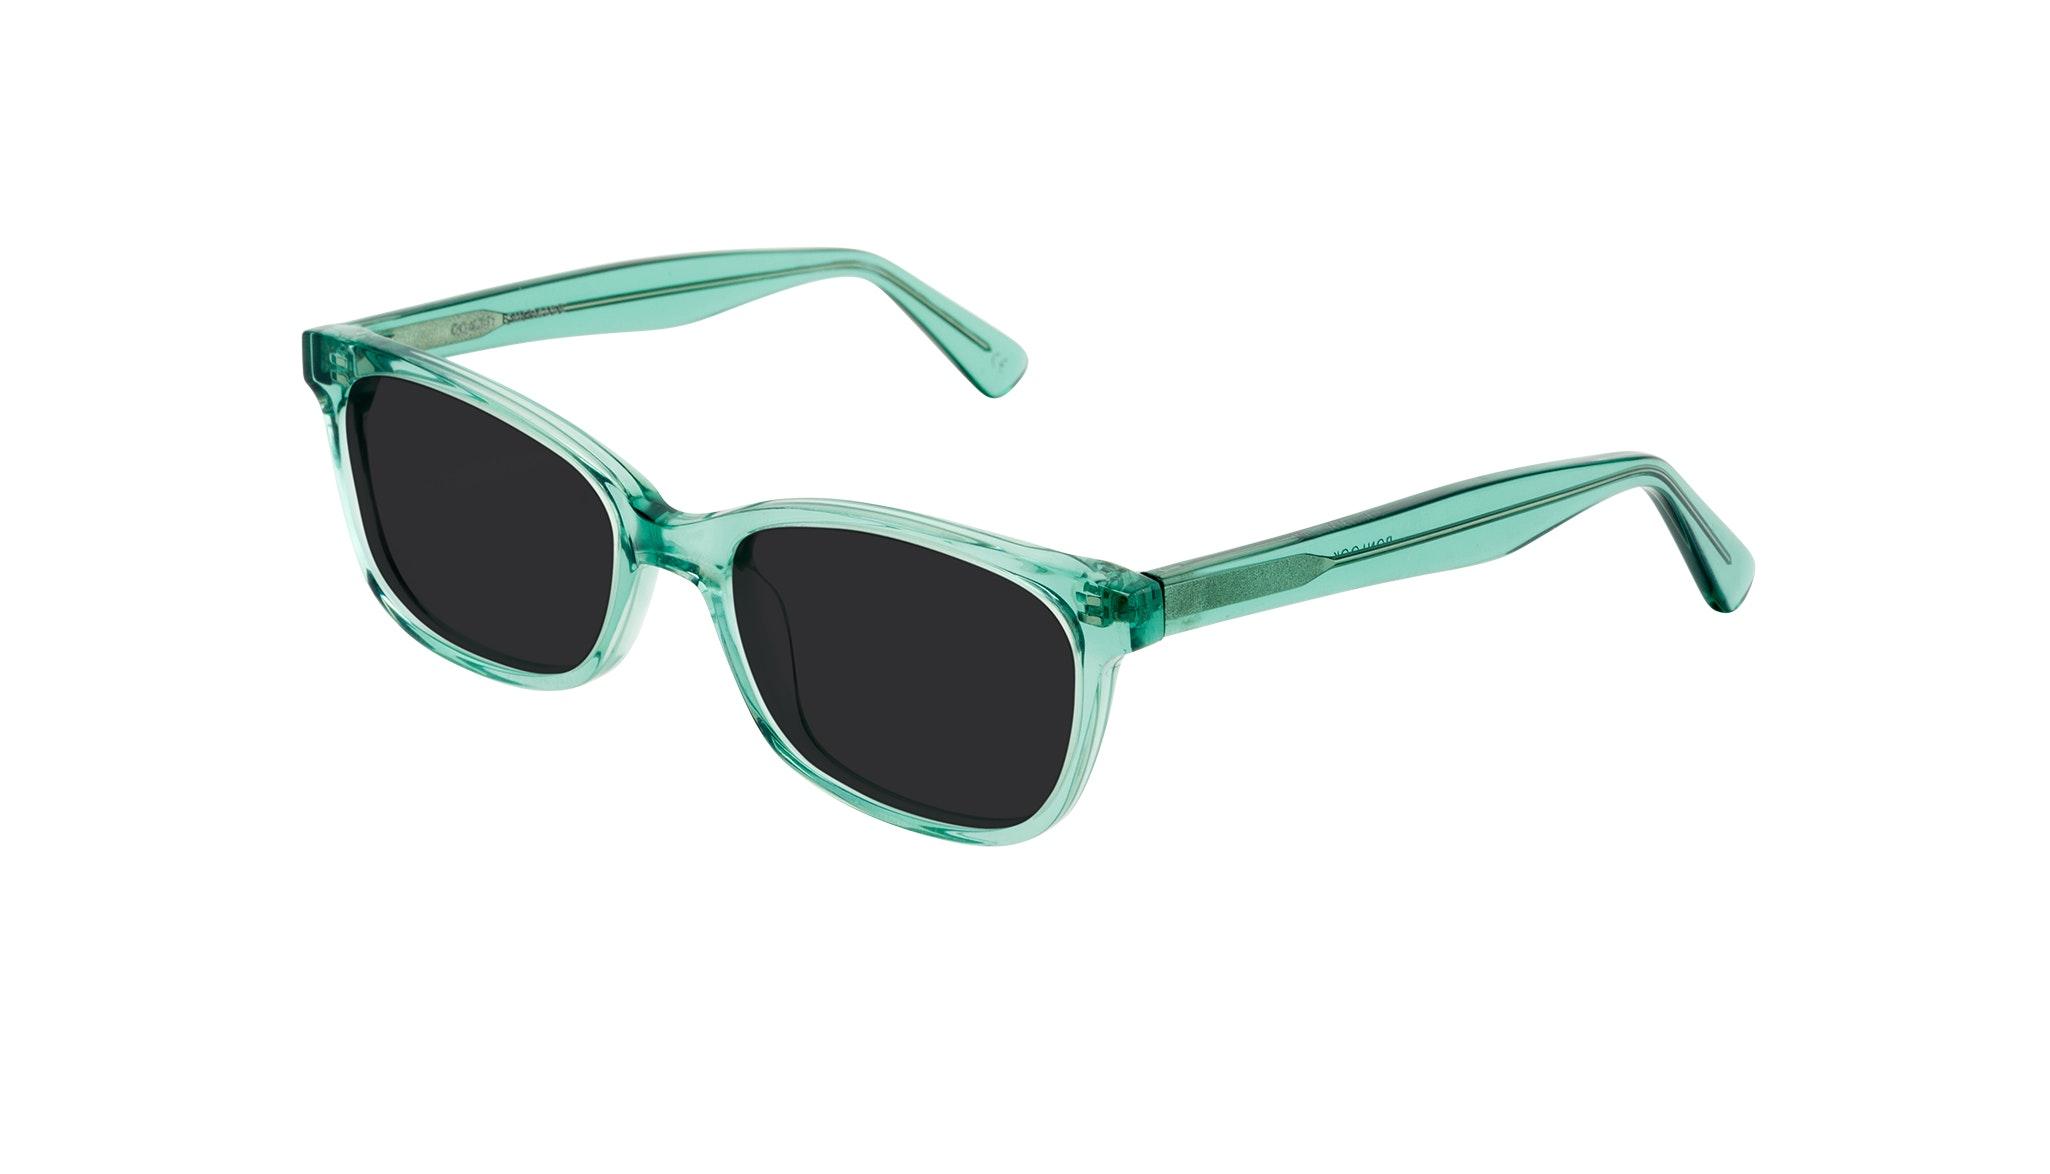 Affordable Fashion Glasses Cat Eye Rectangle Square Sunglasses Women Comet Emeraude Tilt